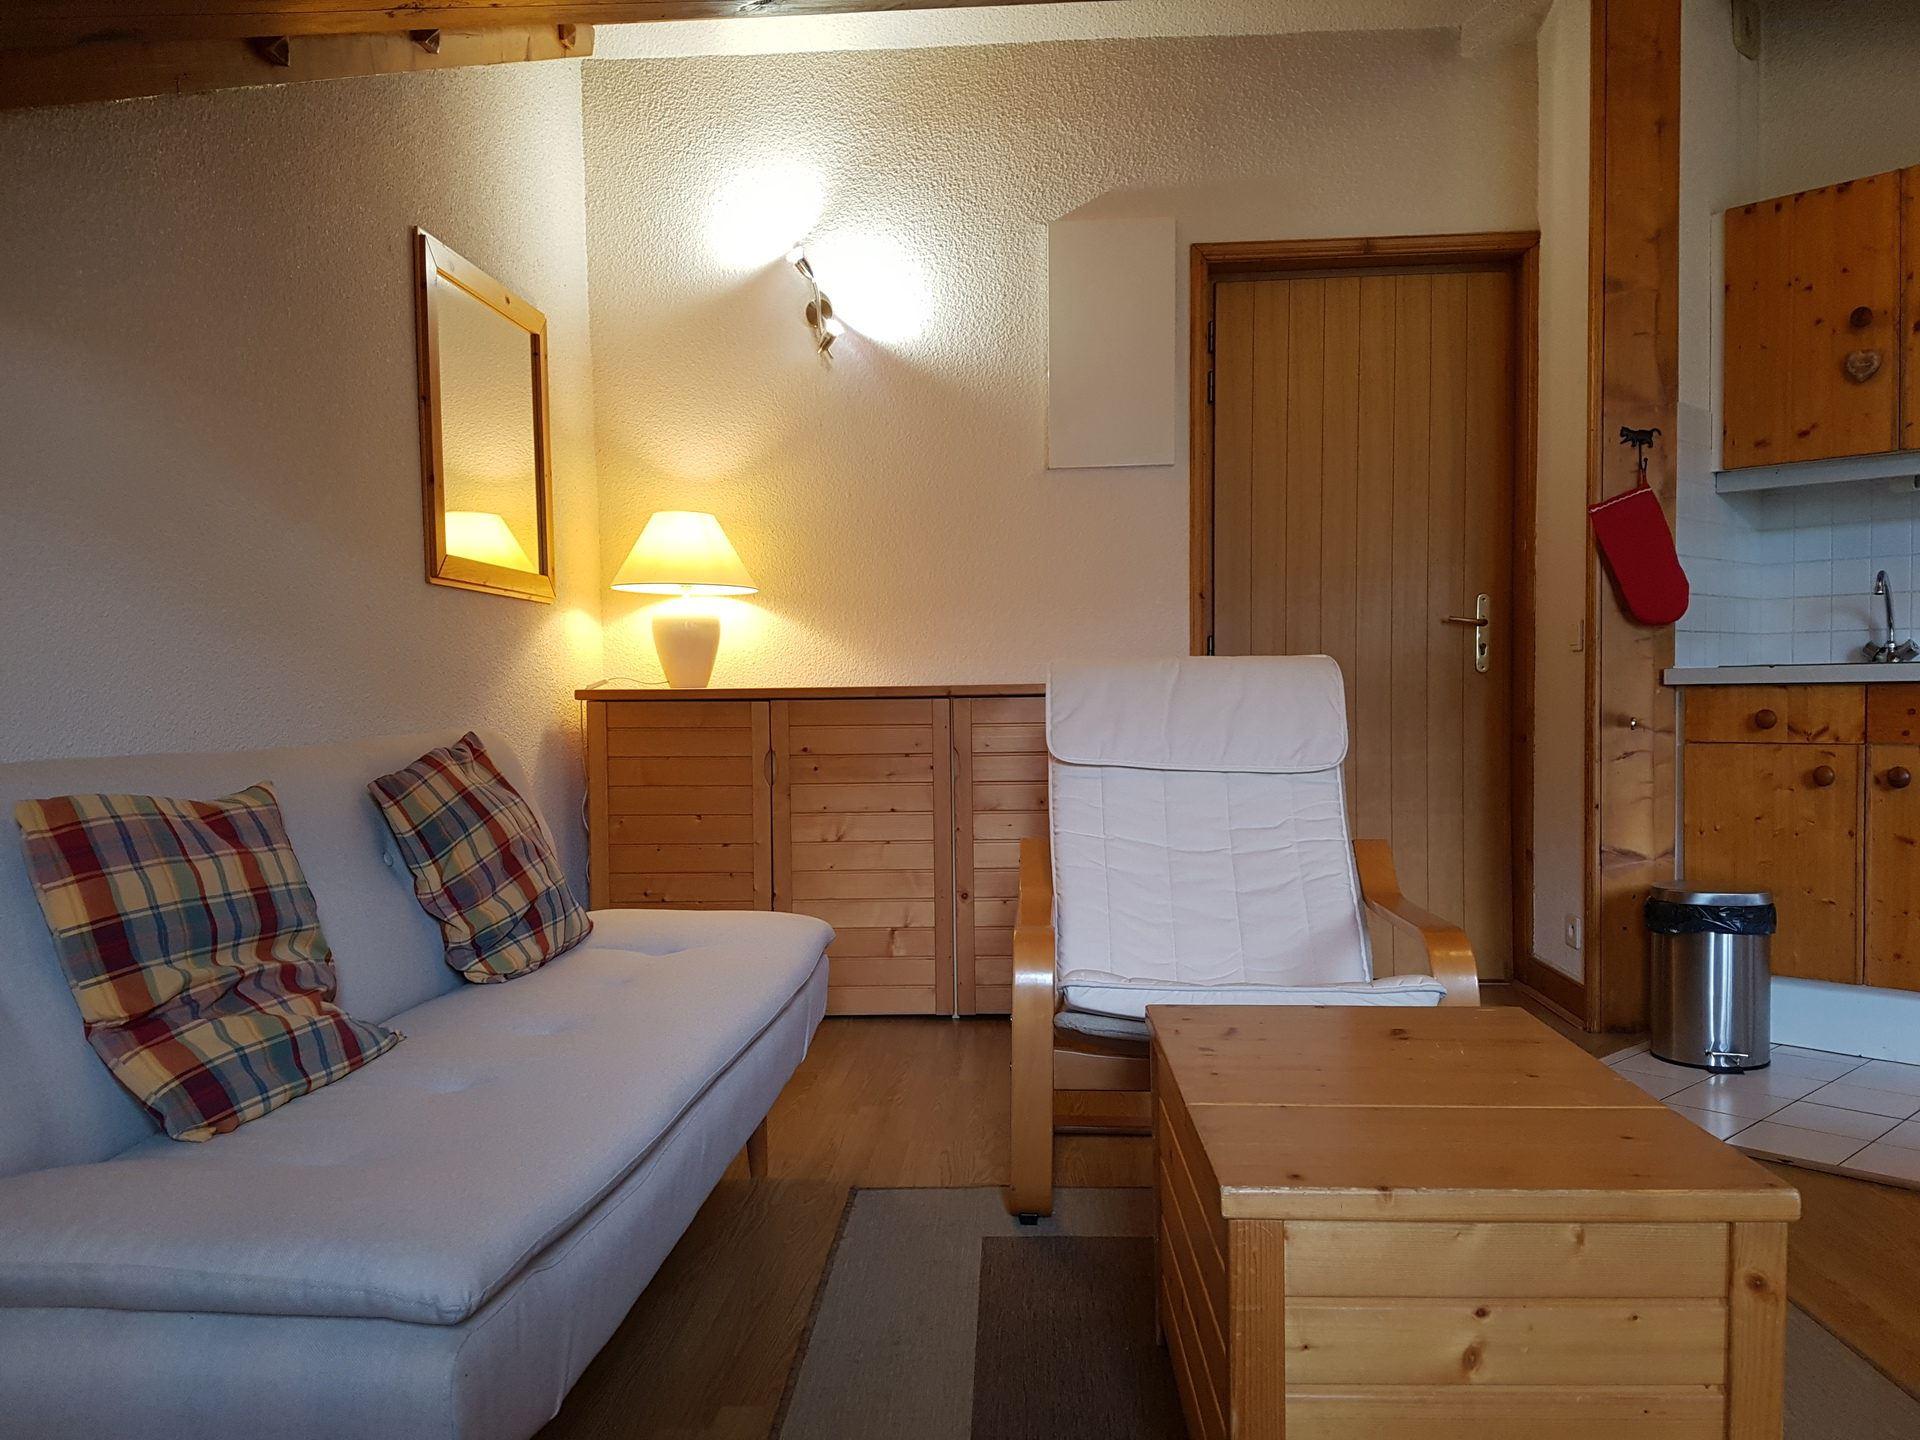 4 Rooms 6 Pers ski-in ski-out / BALCONS DE TOUGNETTE 29